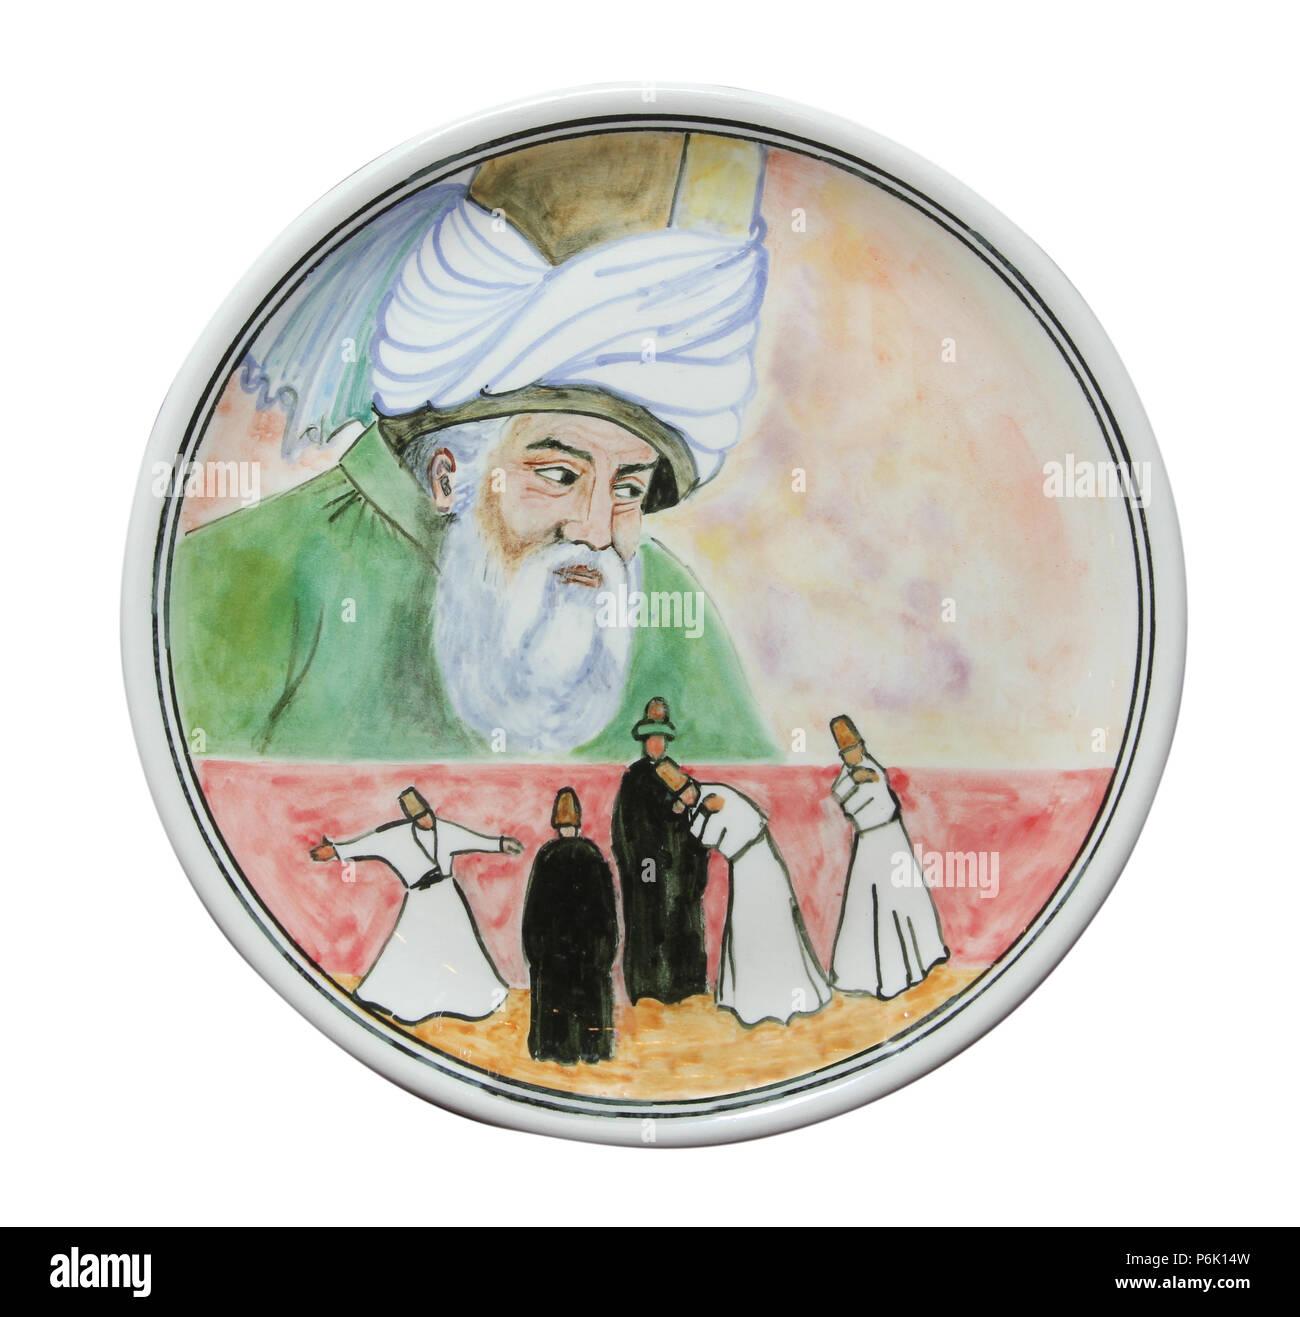 Porcelain Plate - Stock Image